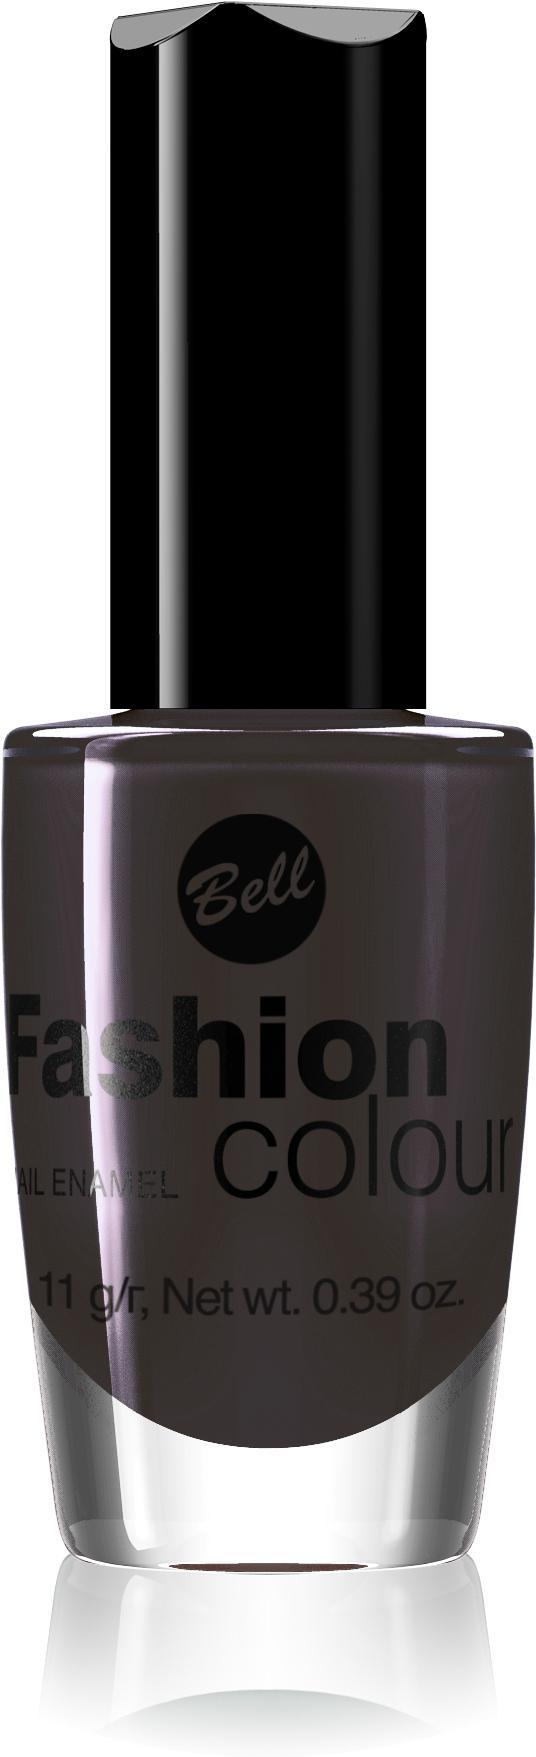 Lakiery Bell fashion colour